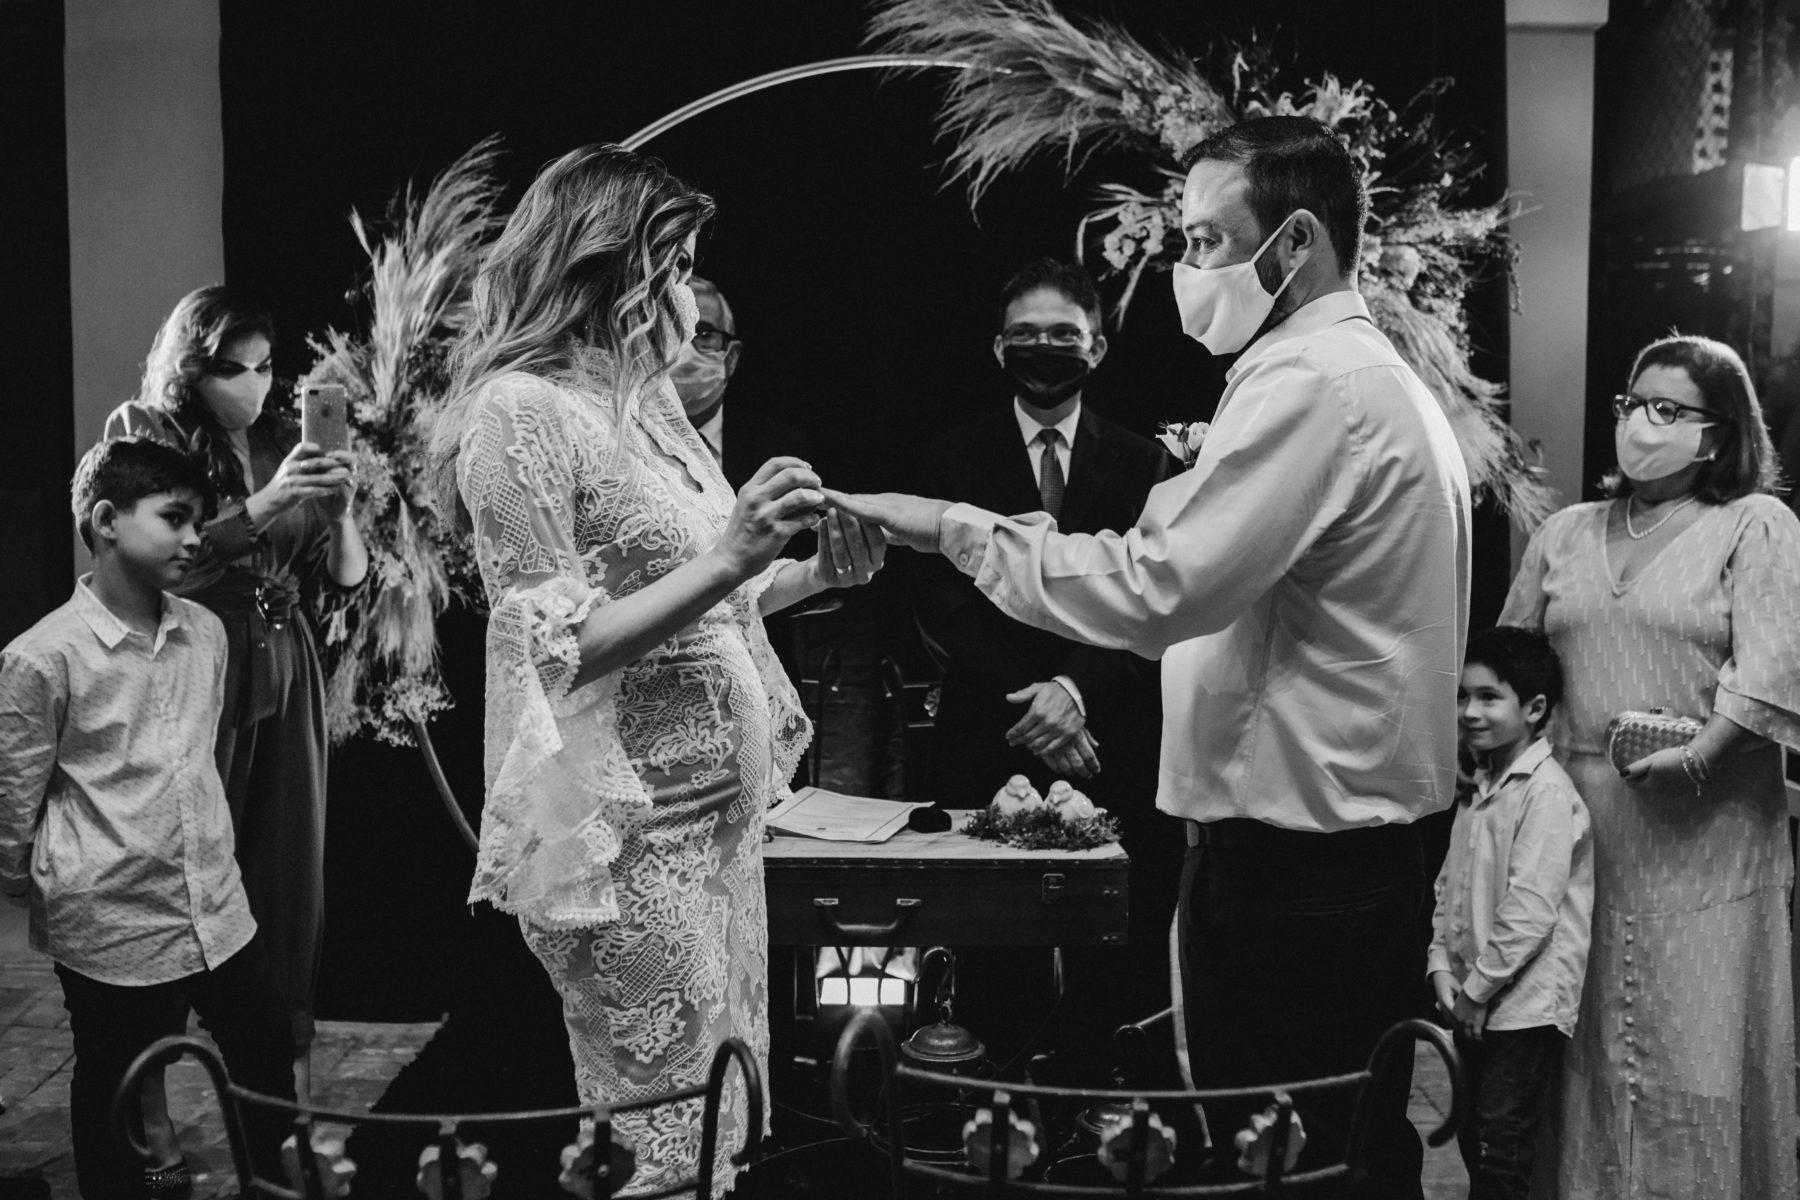 Matrimoni, le nuove regole - foto di Jonathan Borba